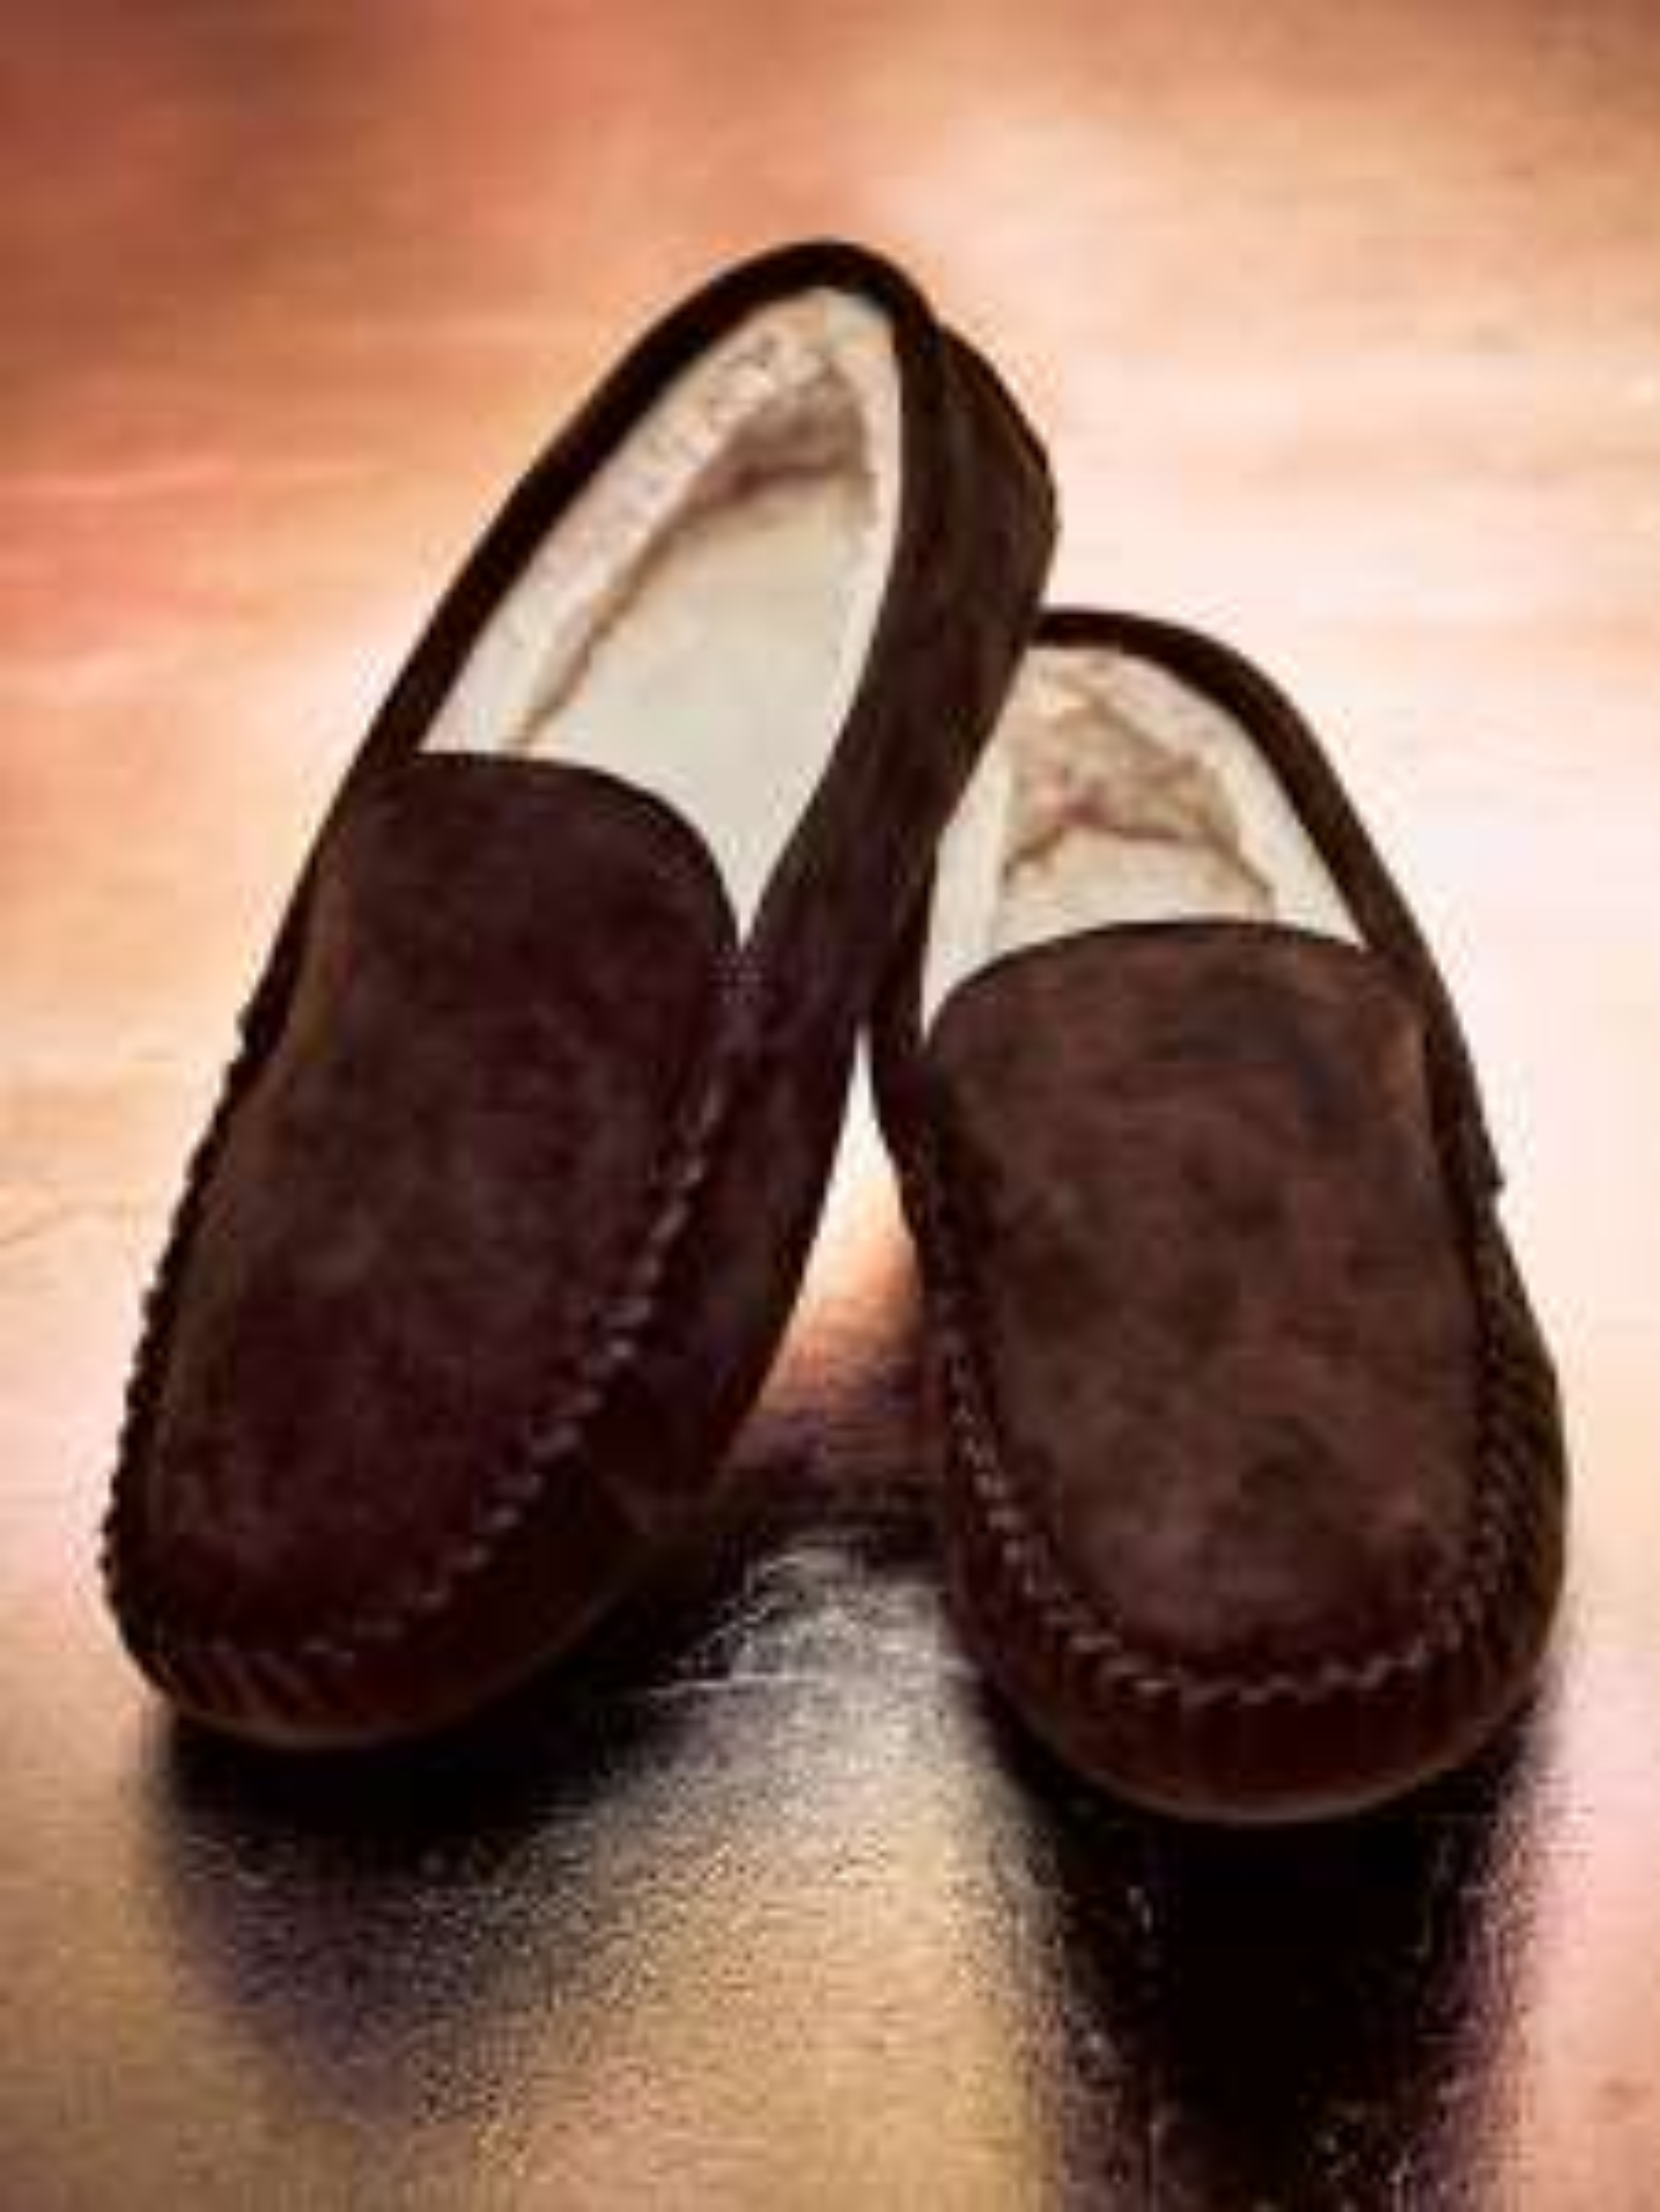 Burgen Suede Moccasin Slippers, Chocolate OR Black @ John Lewis & Partners - £28